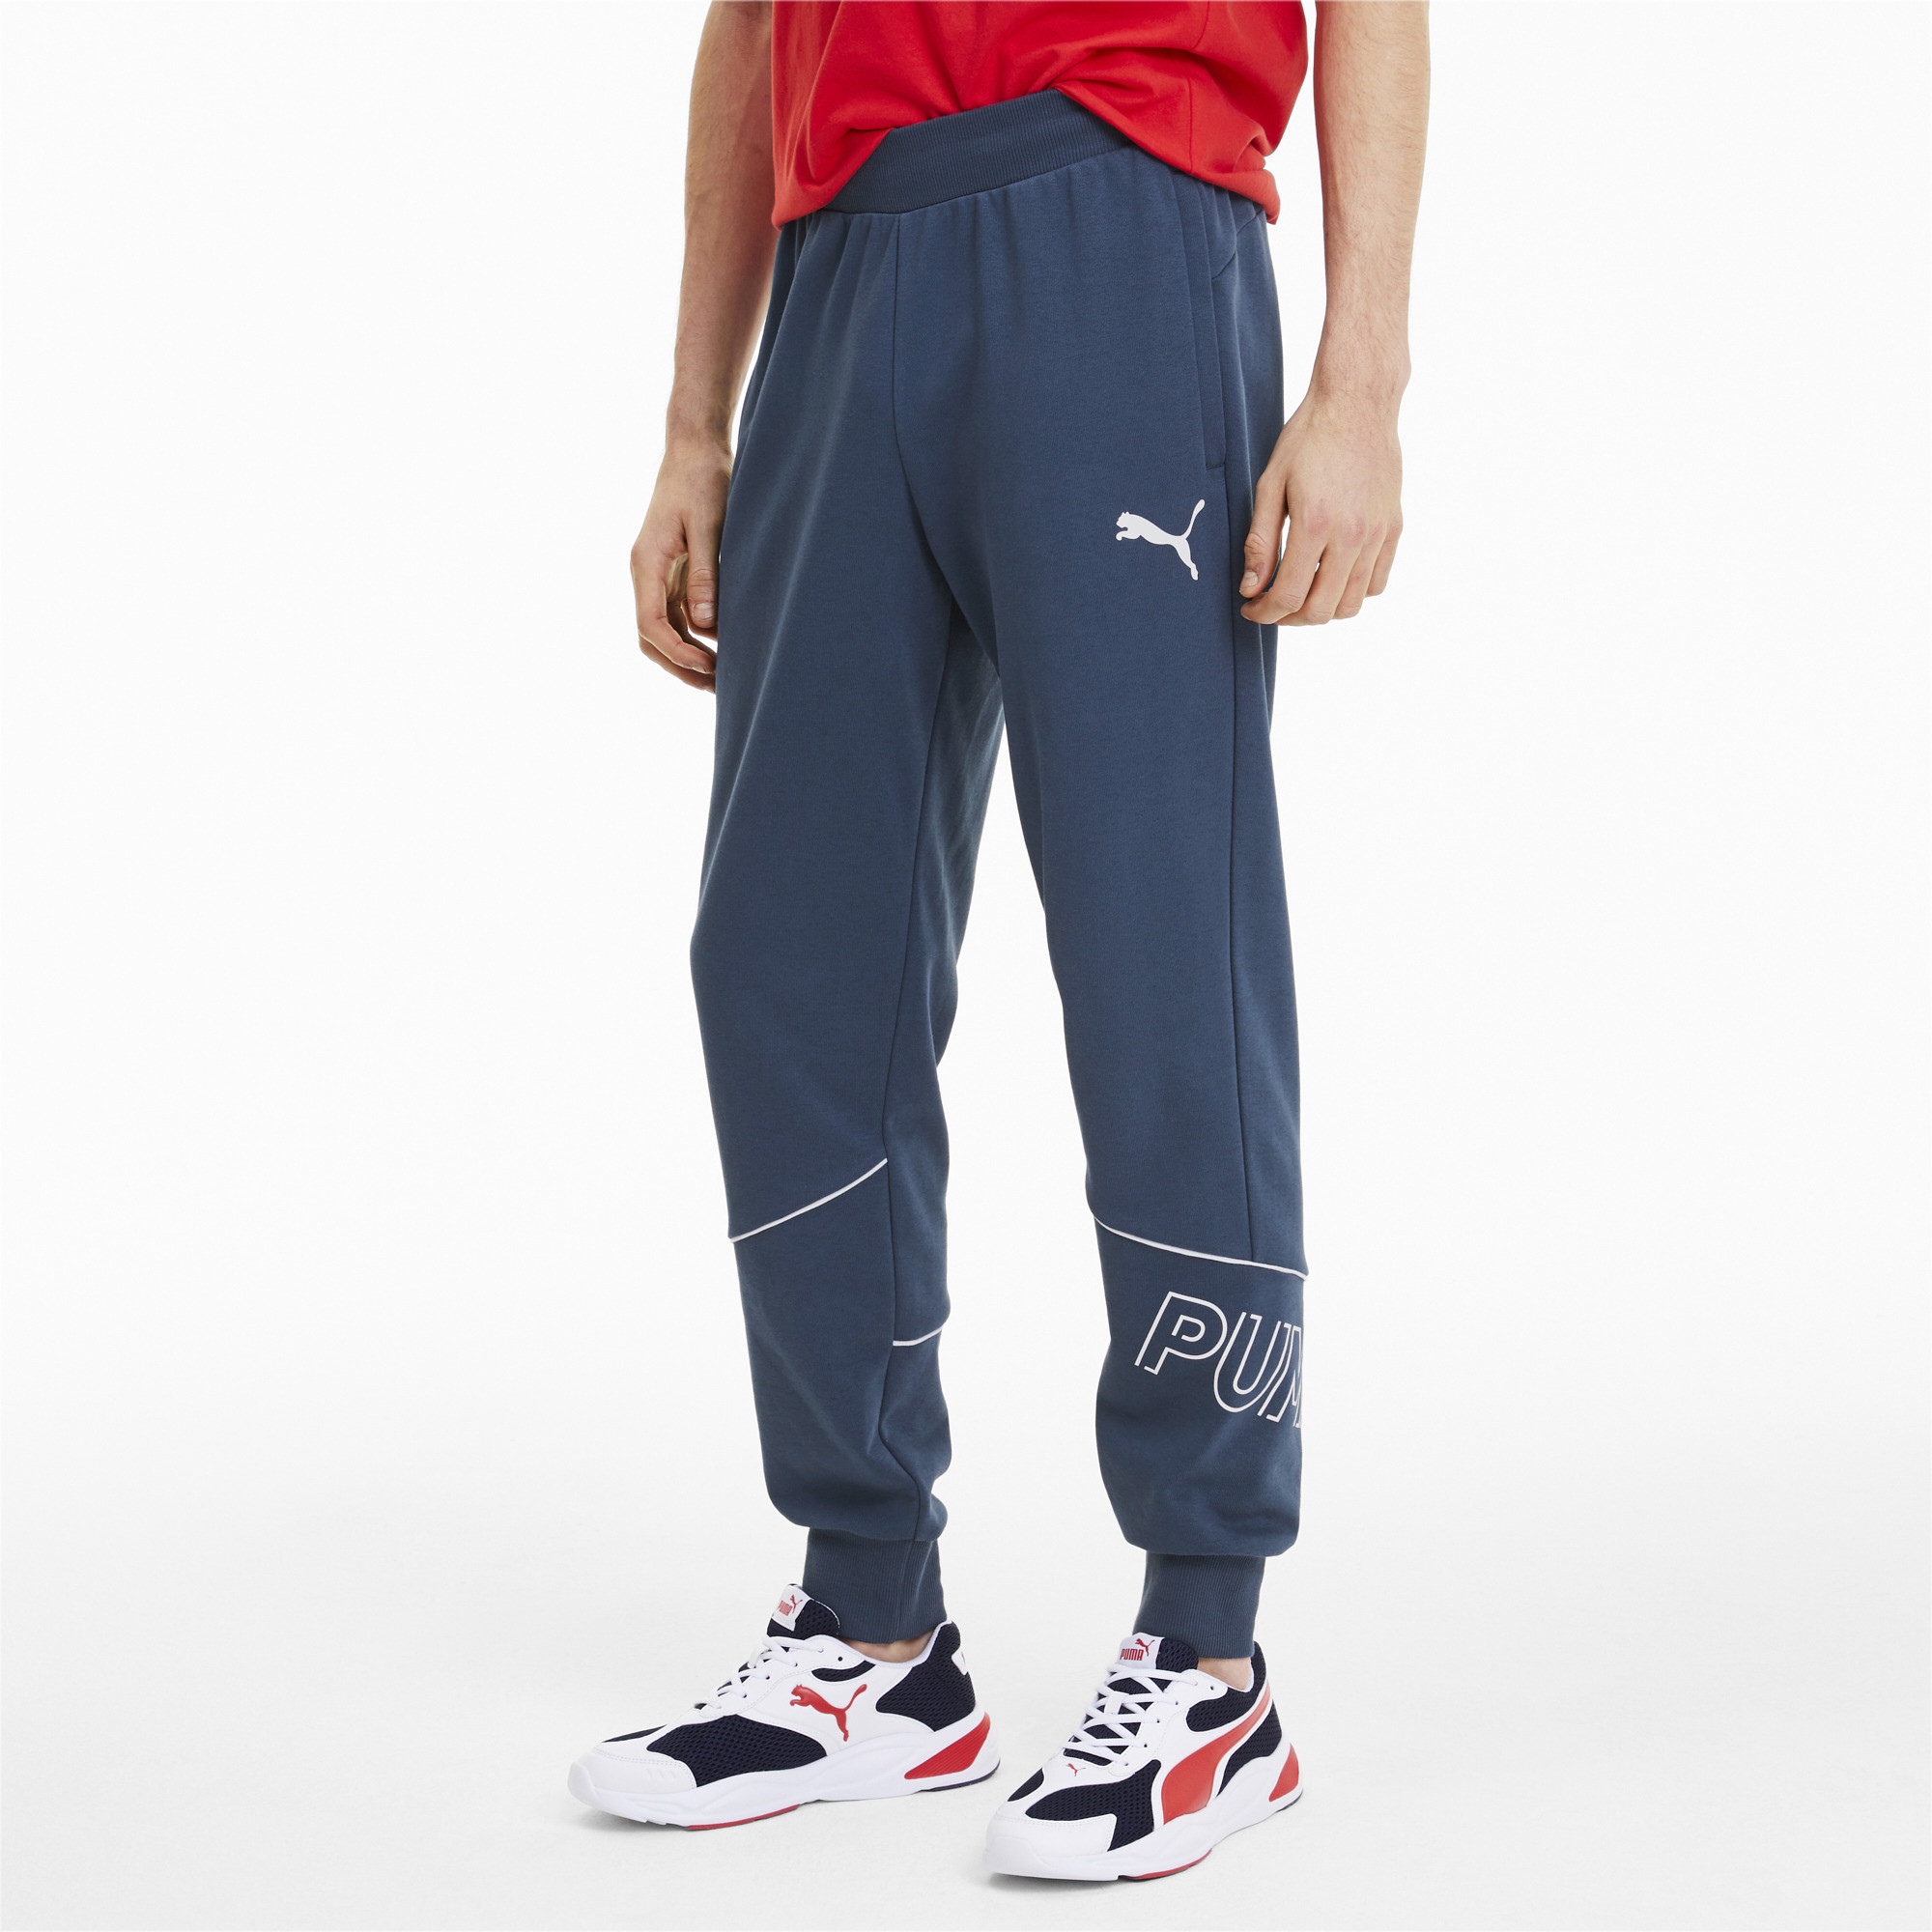 PUMA-Men-039-s-Modern-Sports-Sweatpants thumbnail 14